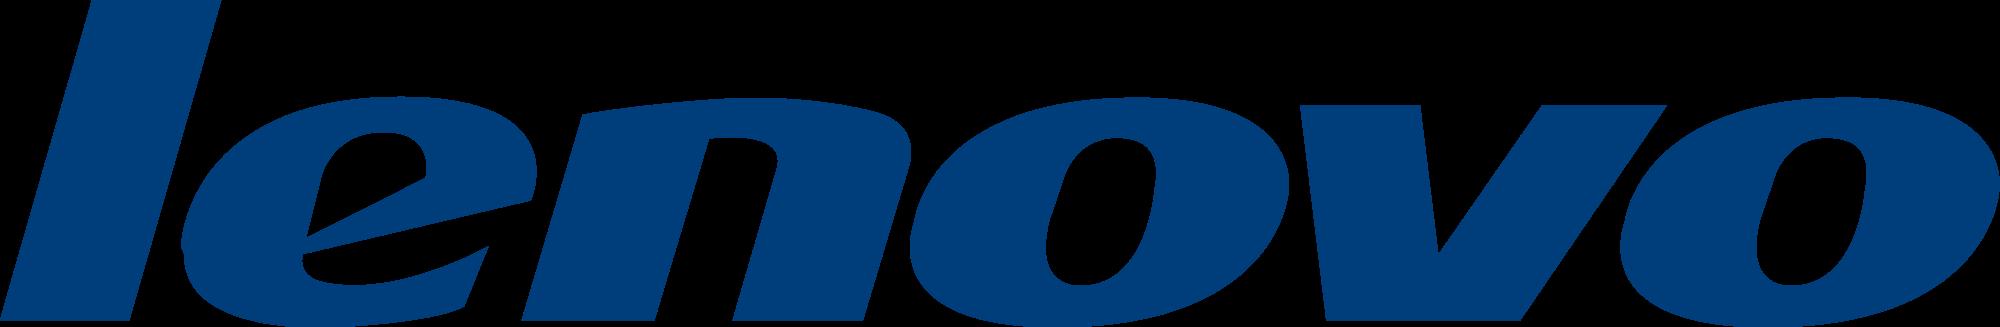 Lenovo-Logo-PNG-Photos.png